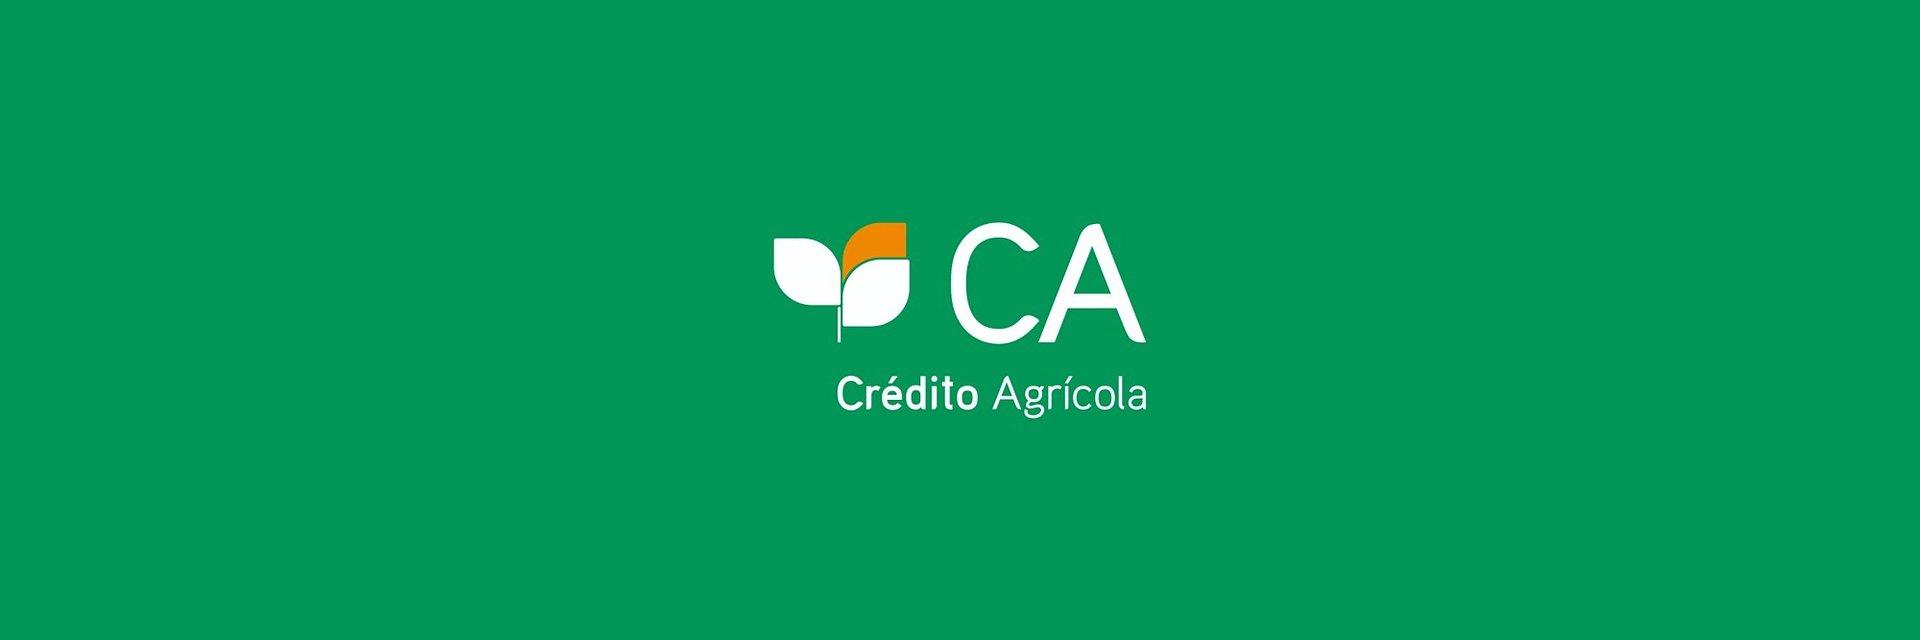 Crédito Agrícola gera 131,5 milhões euros de resultados líquidos